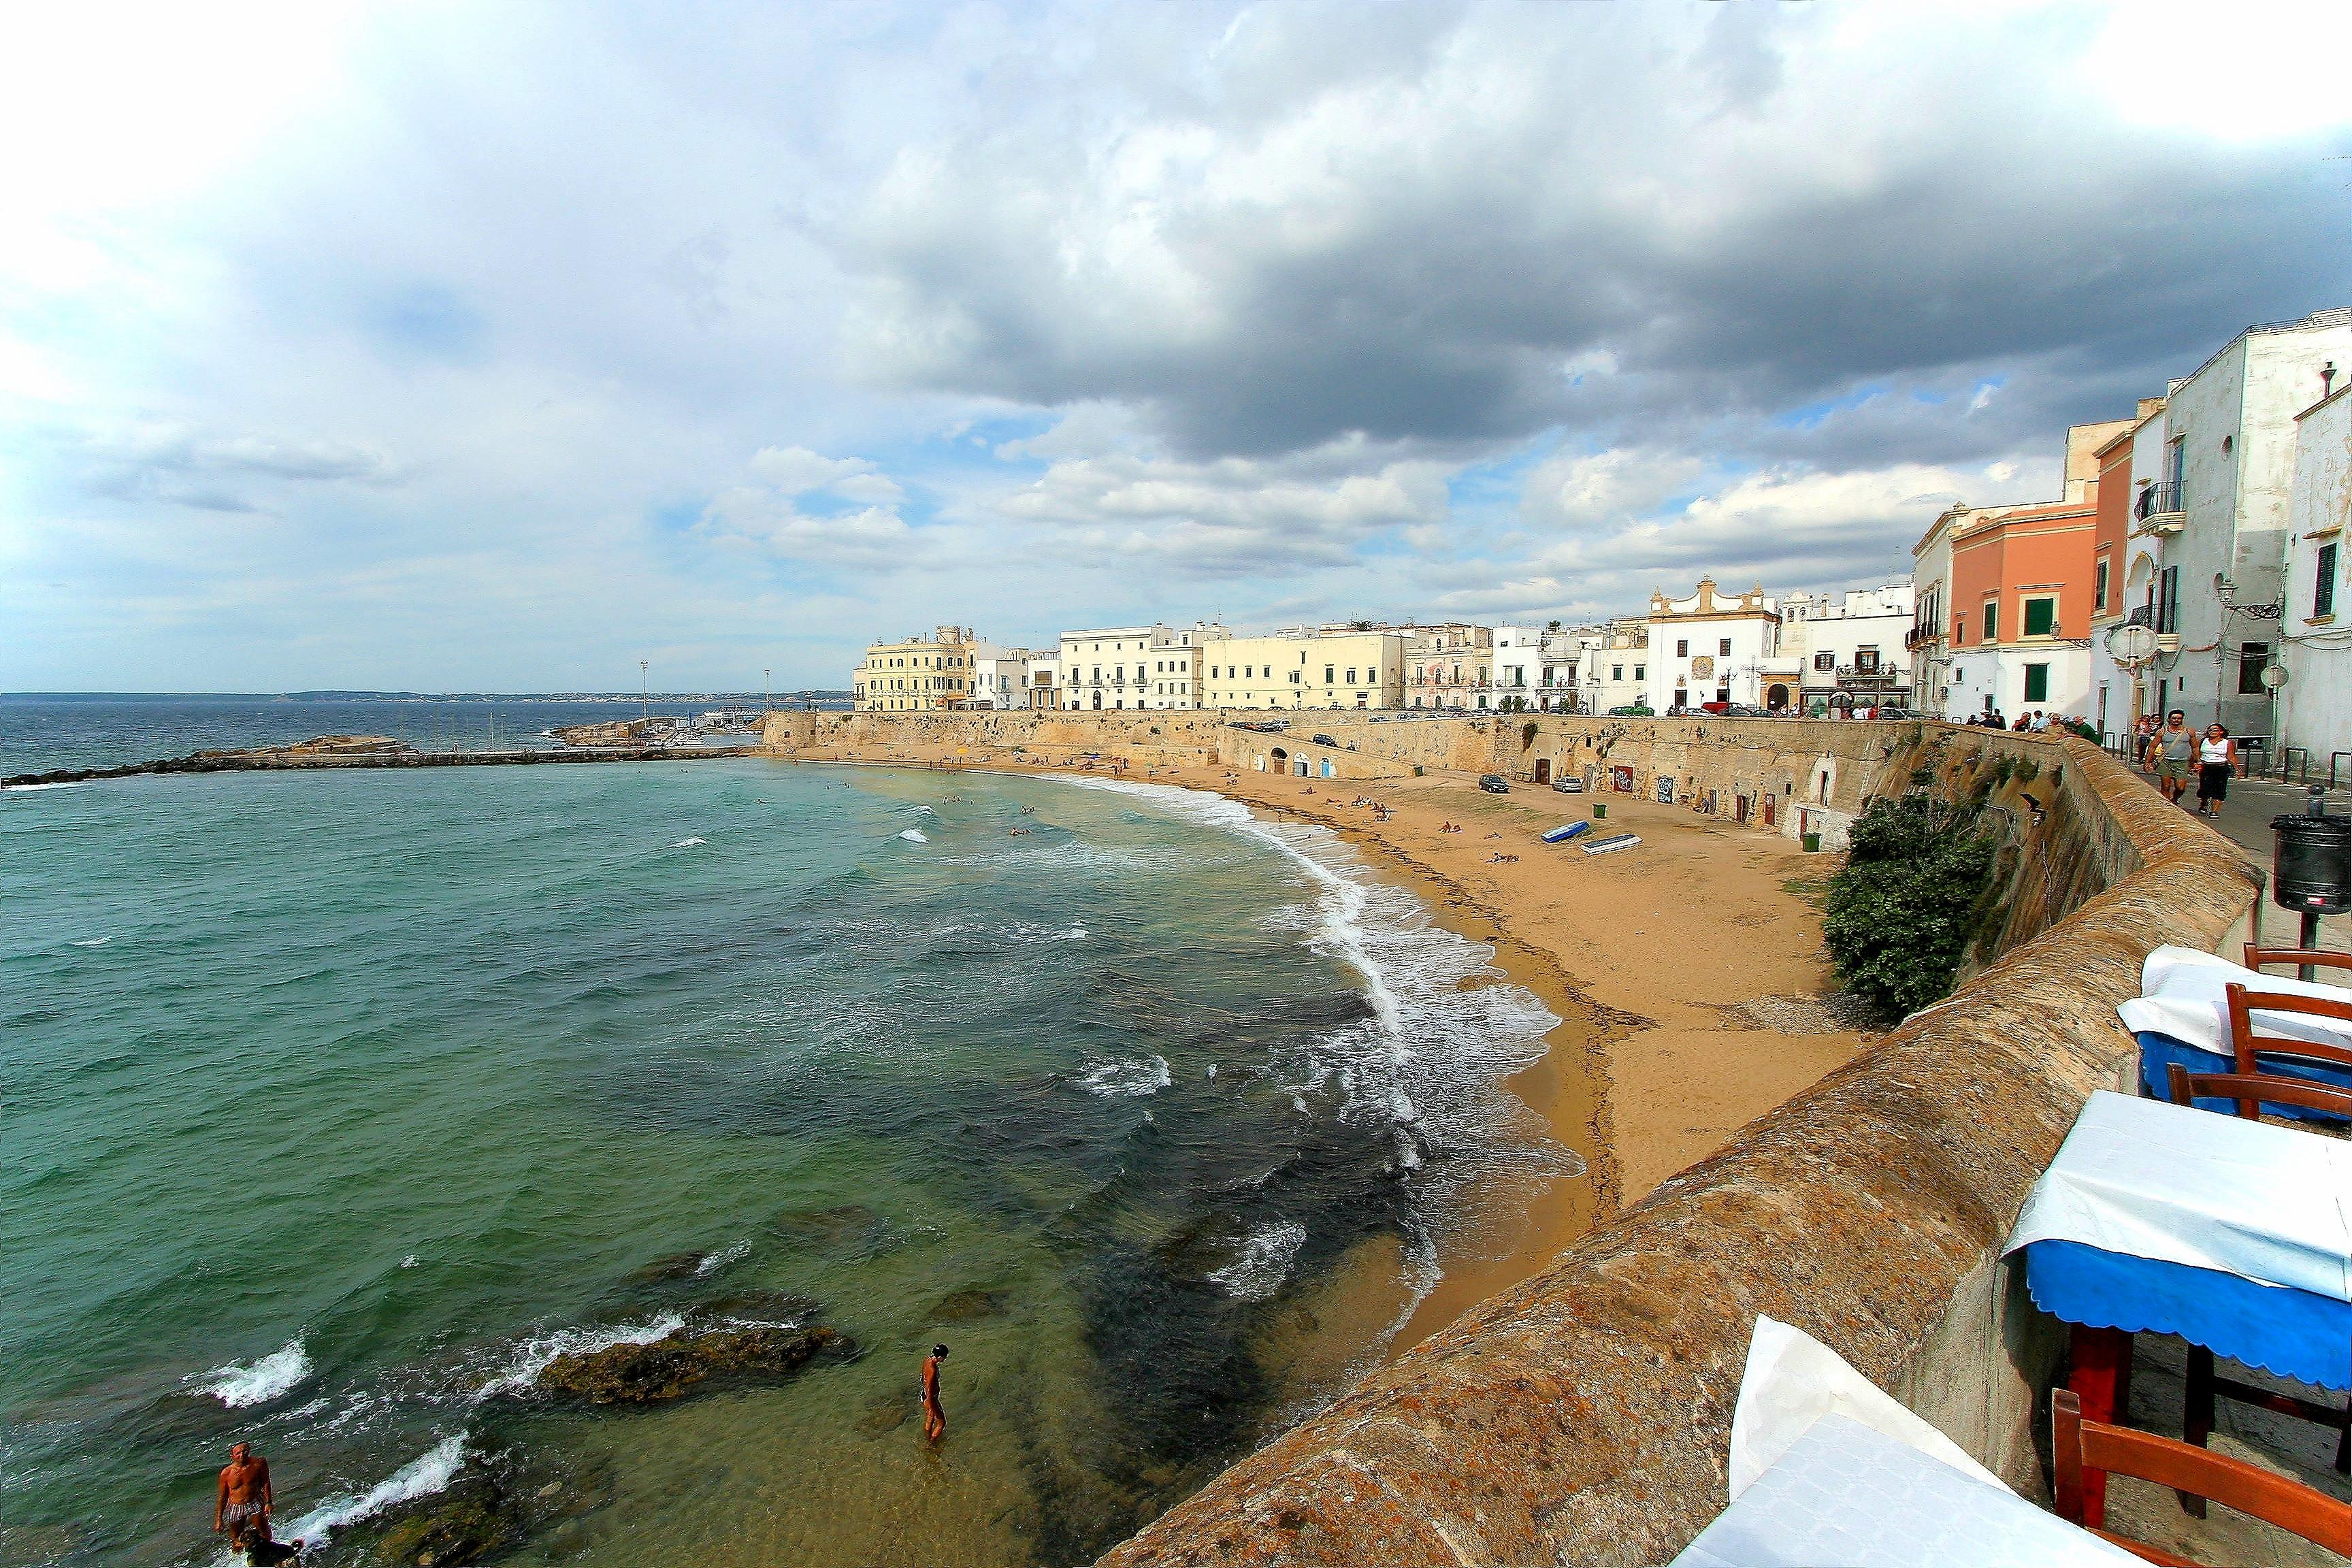 http://upload.wikimedia.org/wikipedia/commons/e/e6/Gallipoli_old_city_beach.jpg